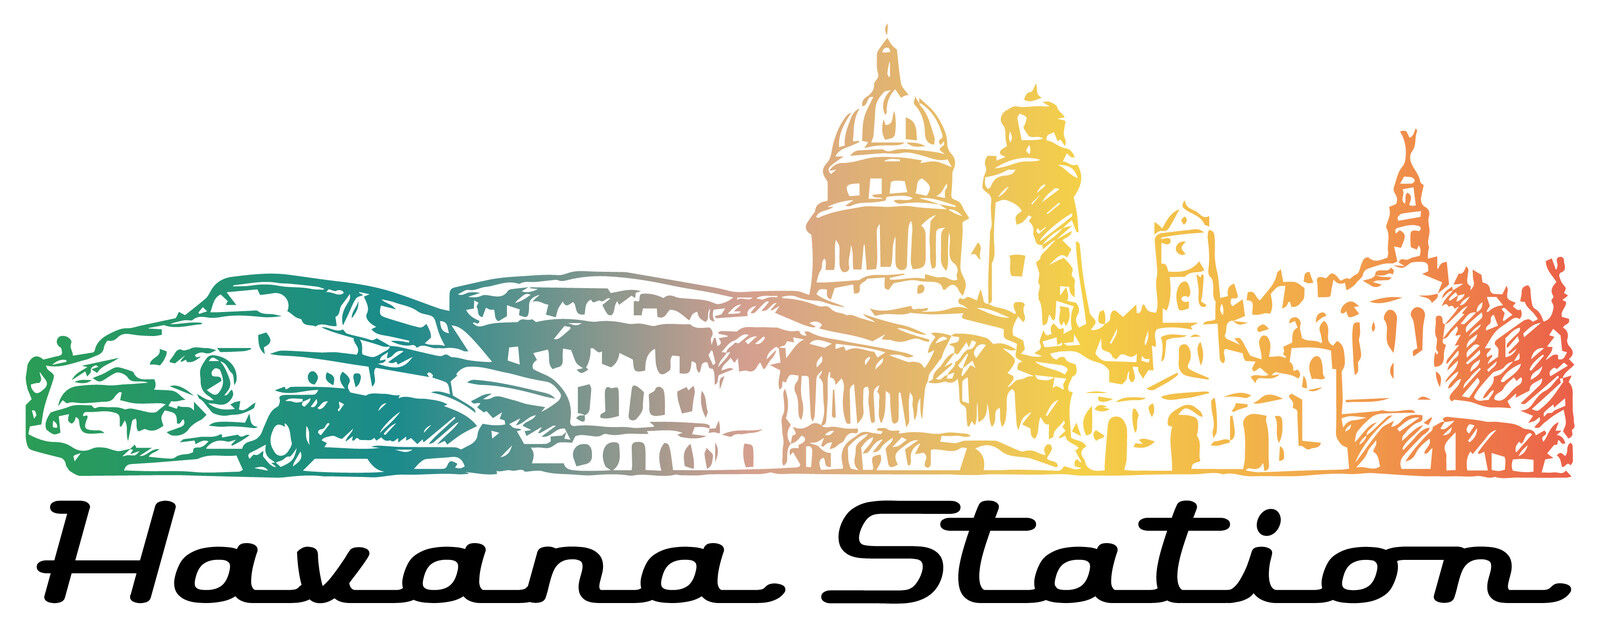 Havana Station